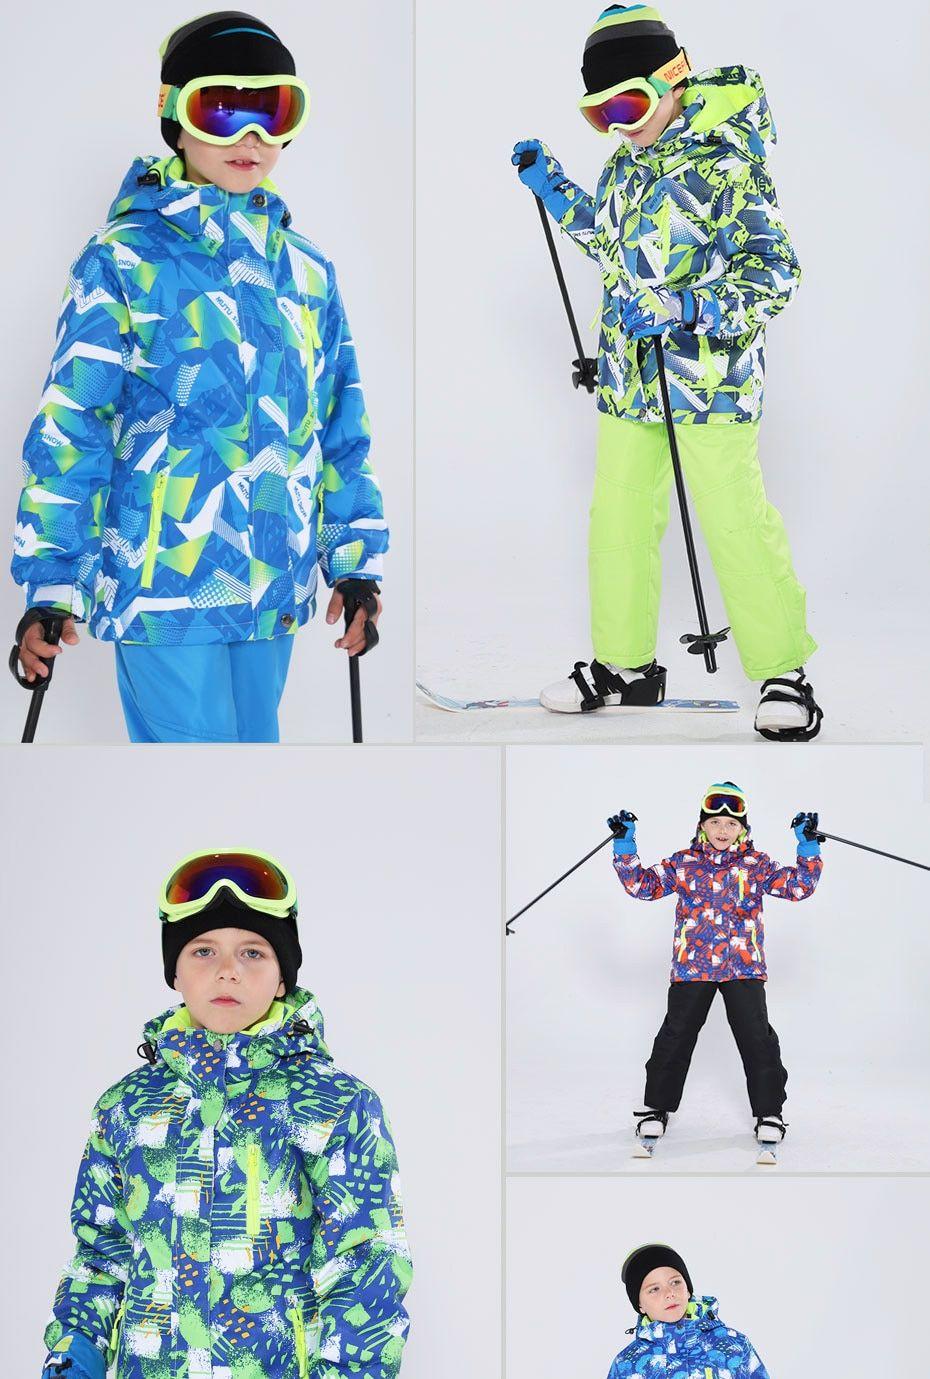 Kids Ski Suit Children Brands Waterproof Warm Girls And Boy Snow Jacke Kids Ski Suit Snowboarding Outfit Kids Skis